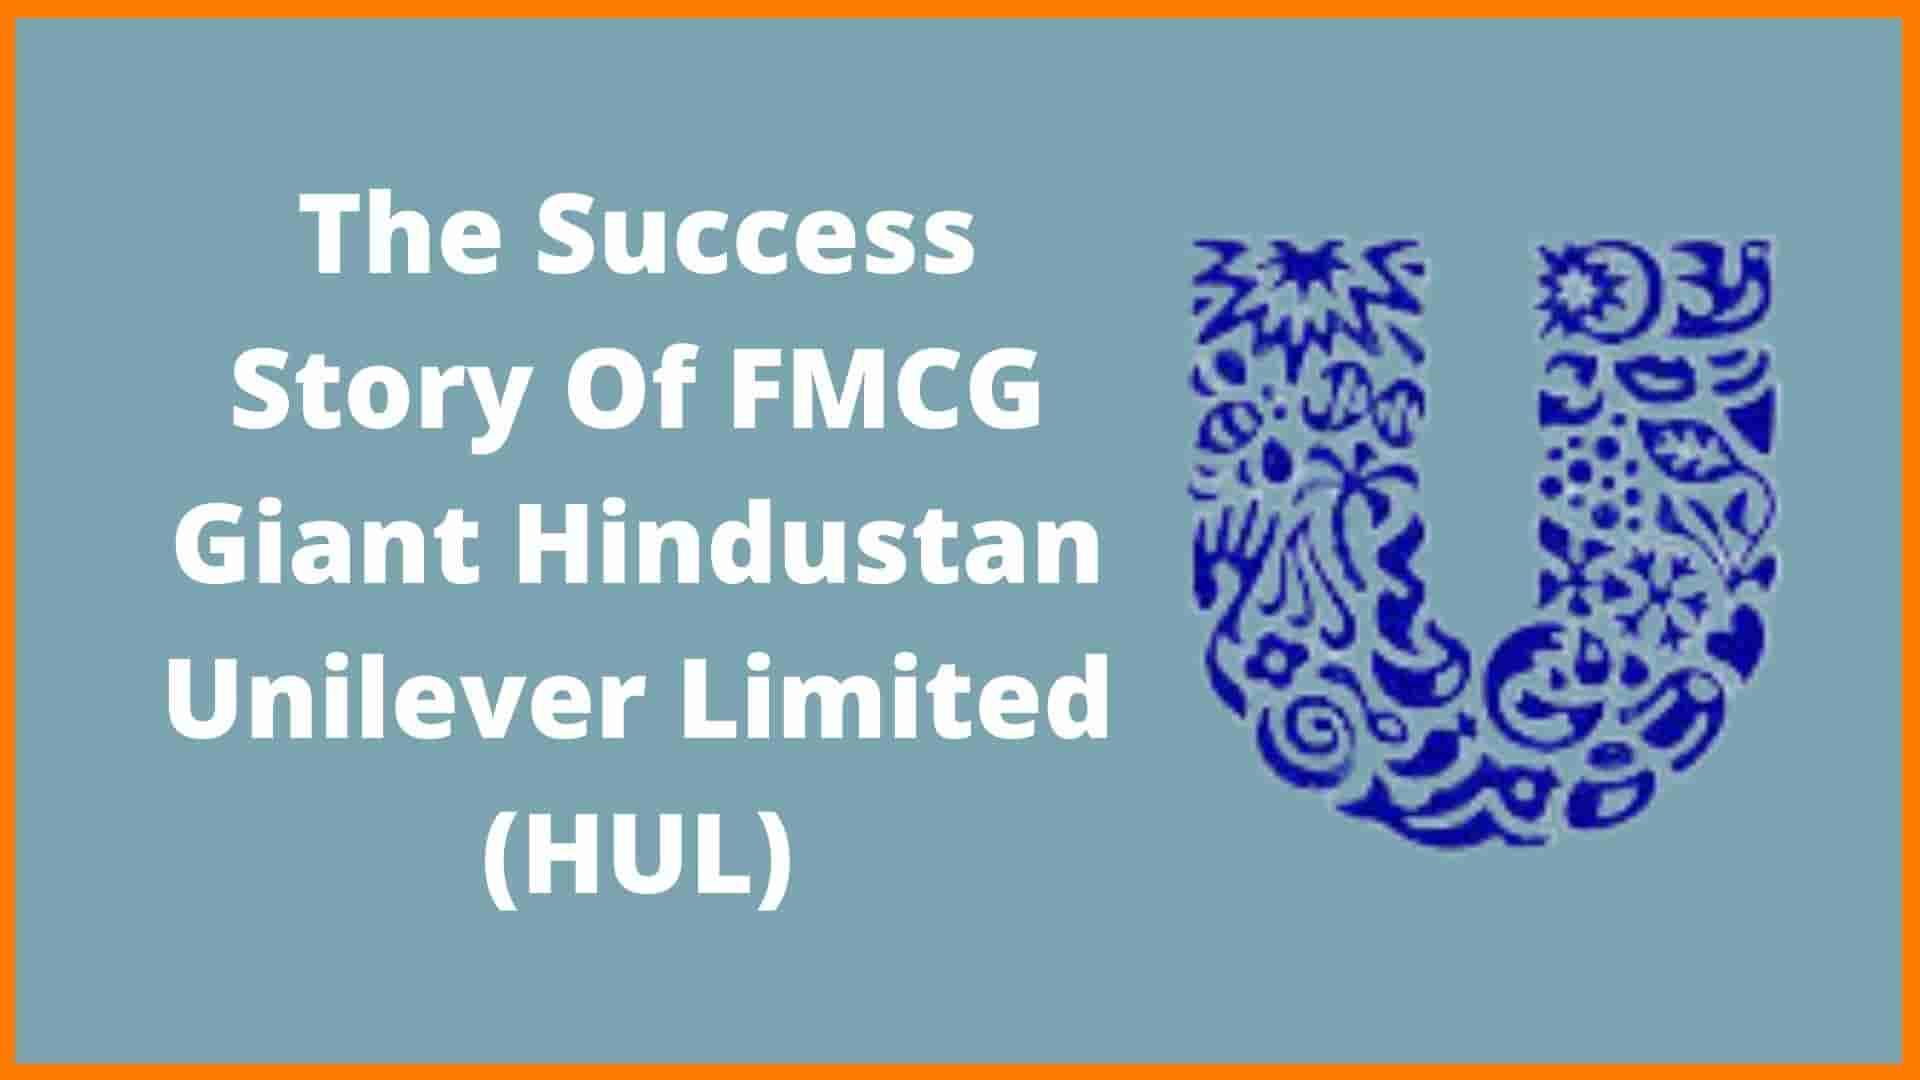 FMCG Giant Hindustan Unilever Limited (HUL) Case Study